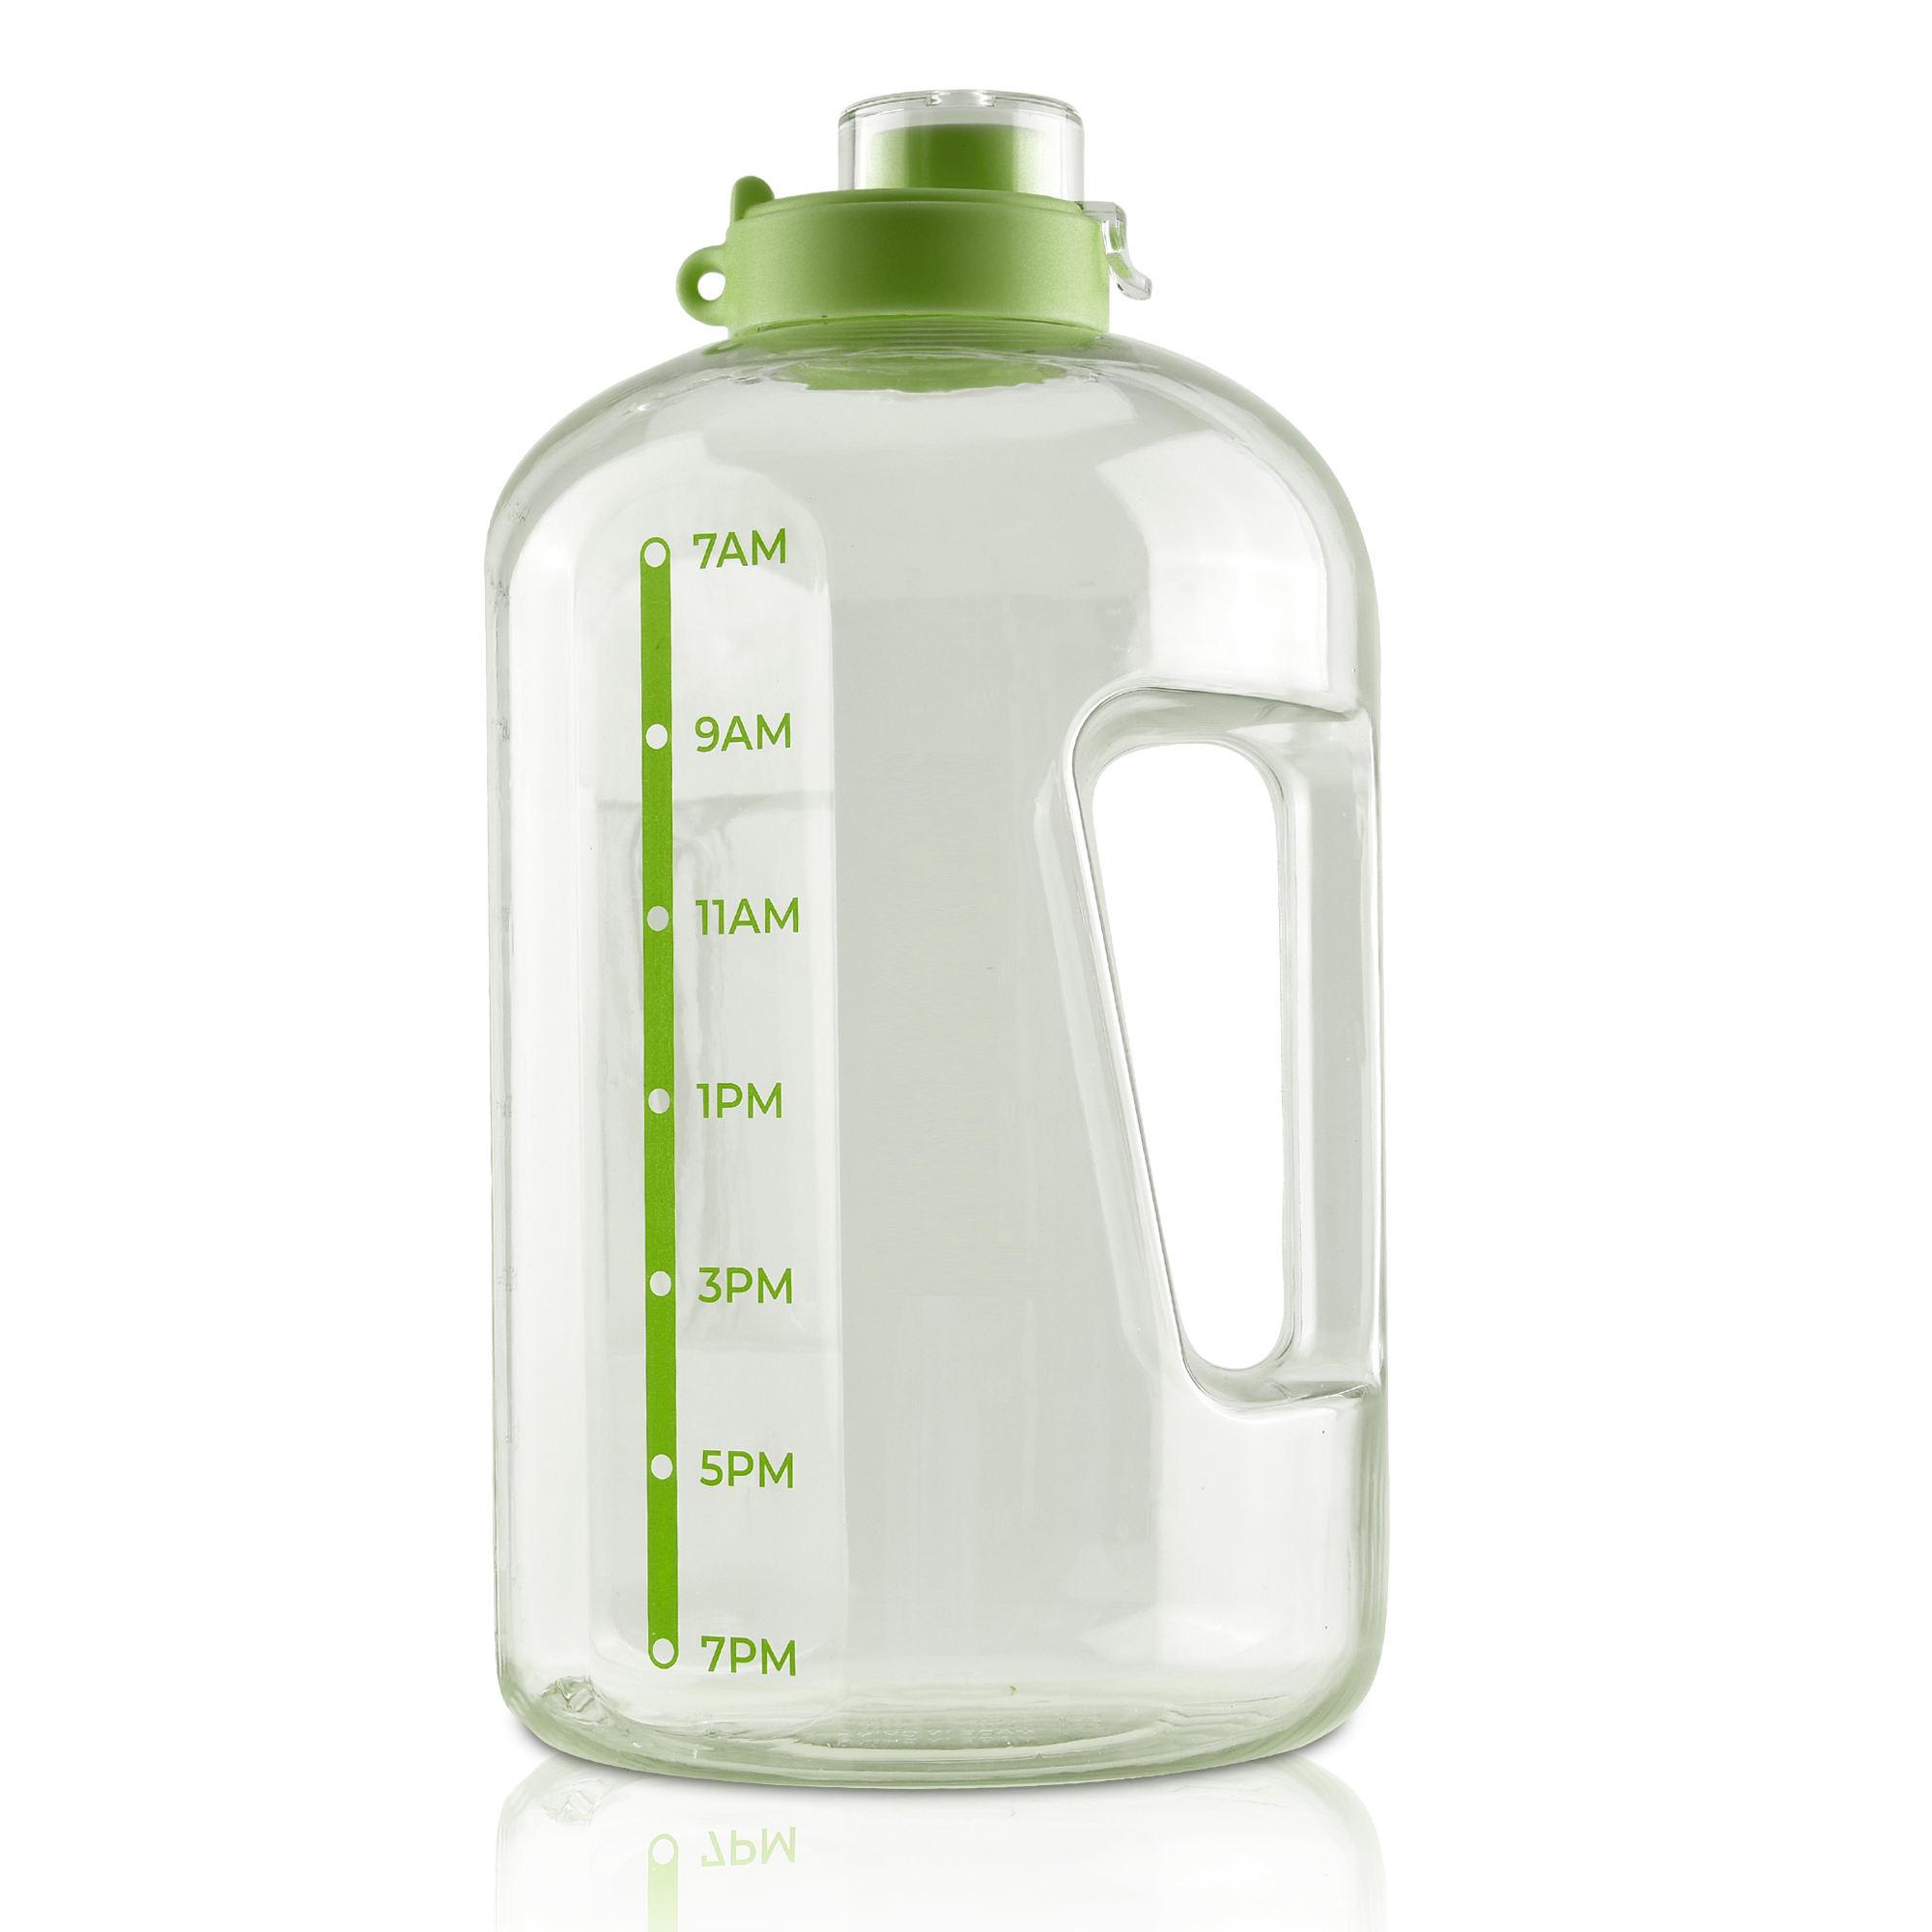 Dishwasher Safe One Gallon Leak-Proof Drinking Water Jug Bottle with Time Marker